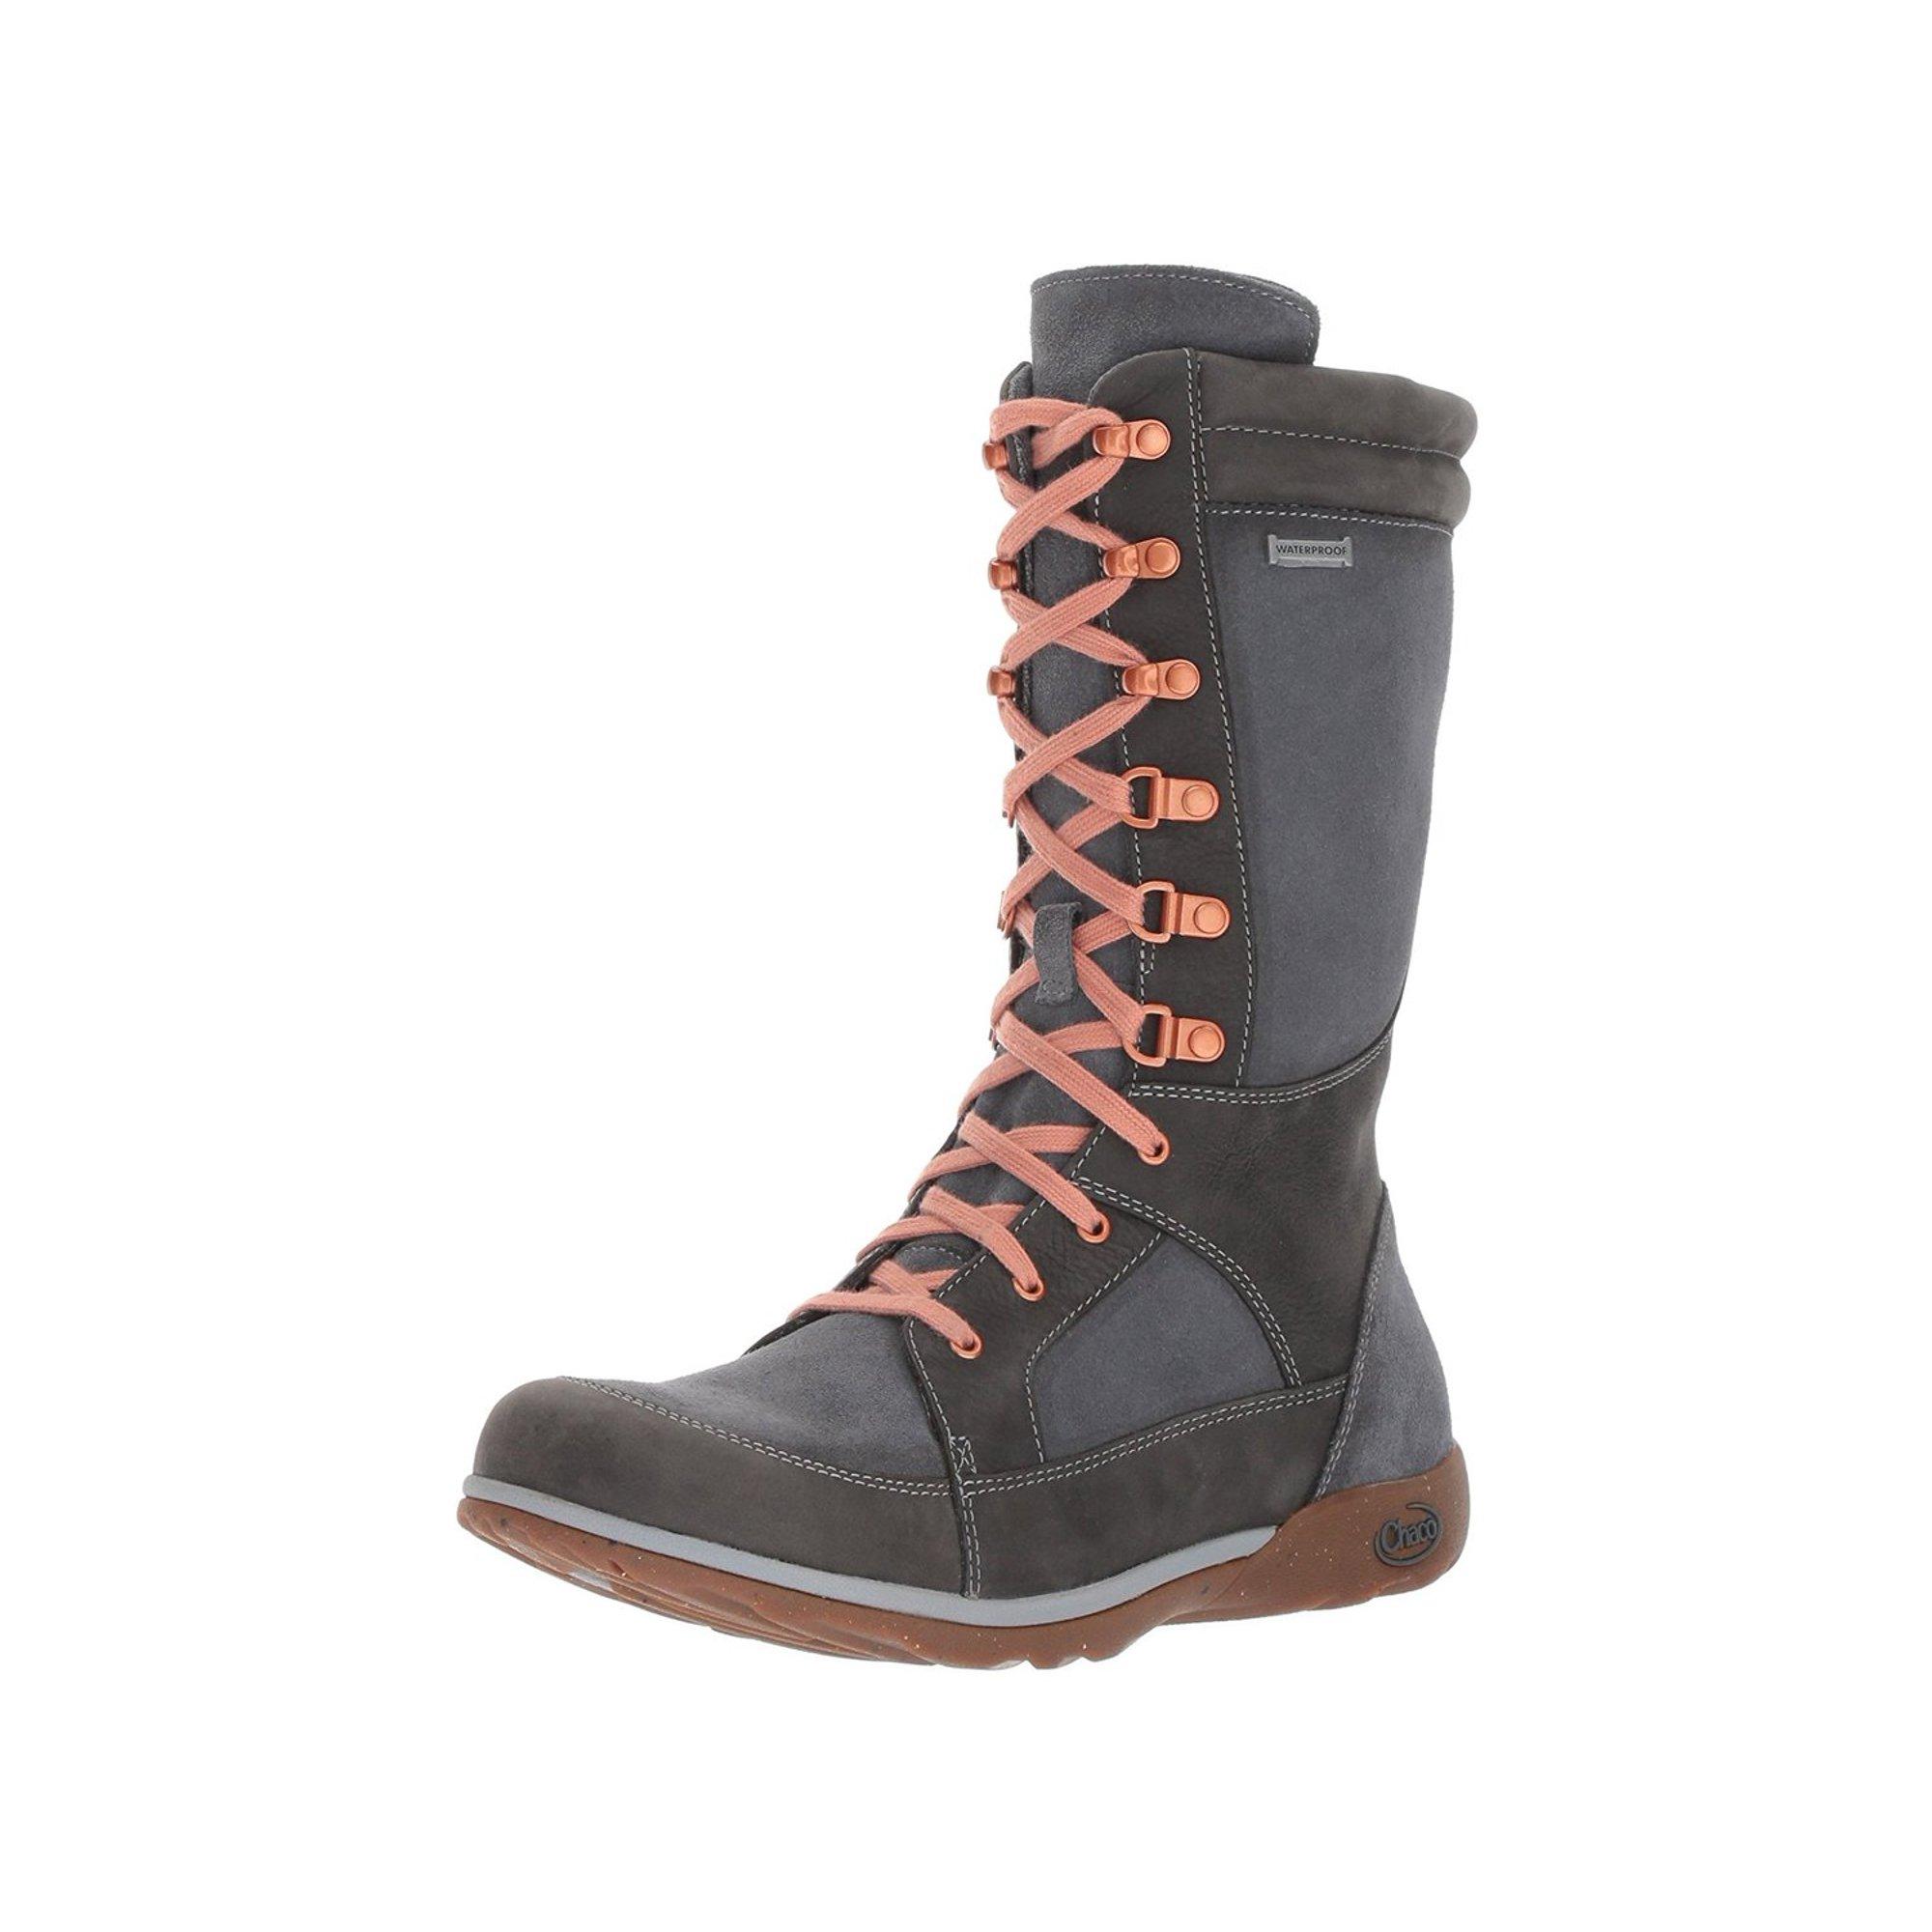 4f9b086759a Chaco Women's Lodge Waterproof Mid Calf Boot, , | Walmart Canada